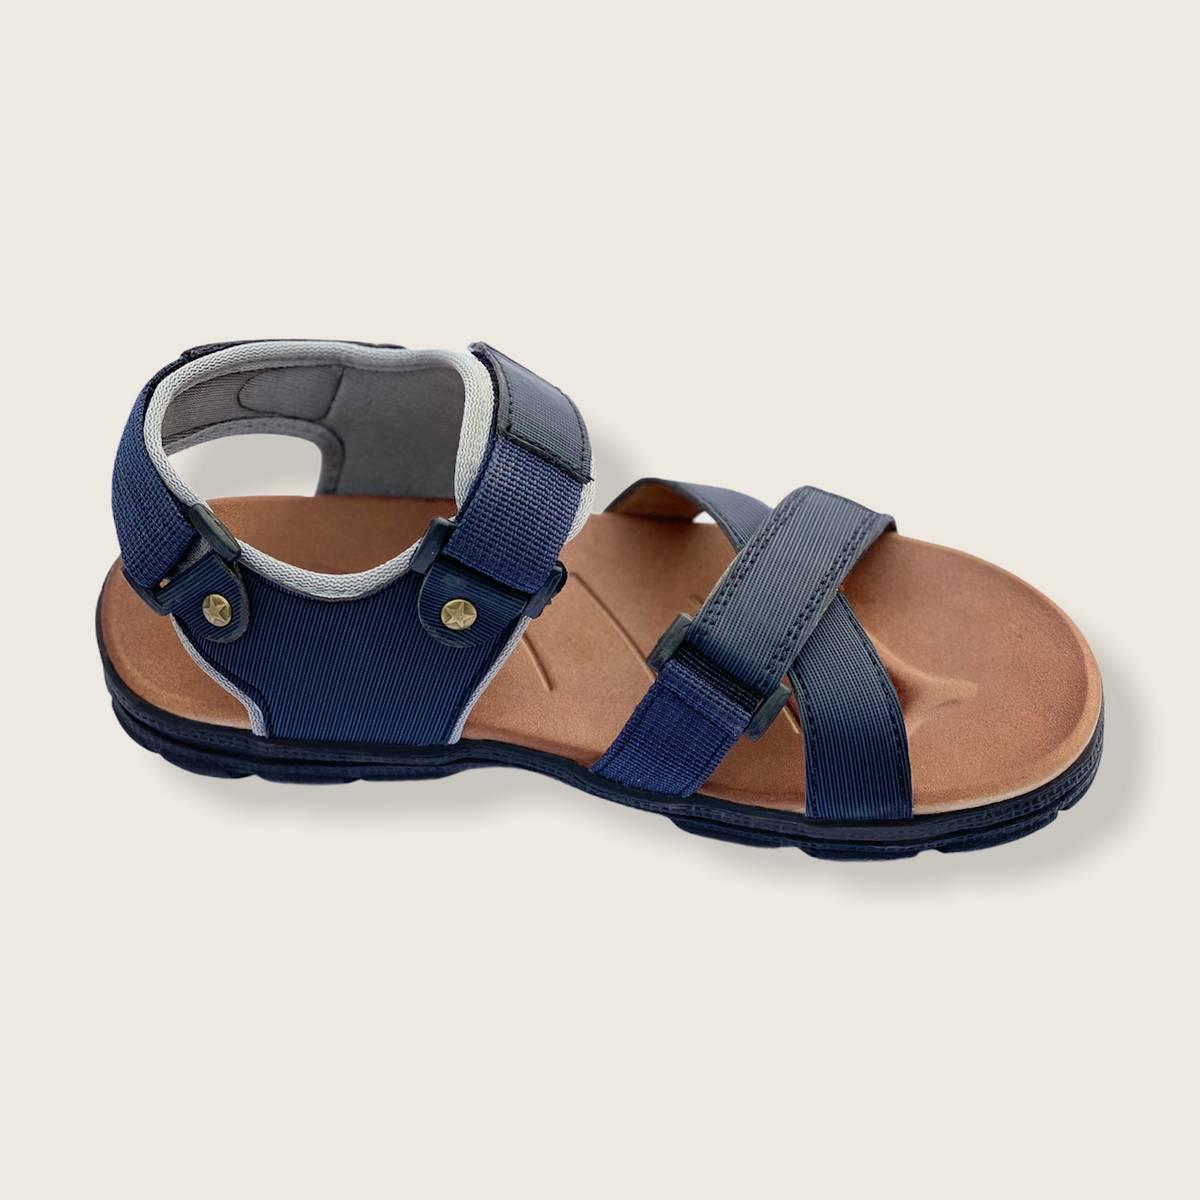 Flash Sandals - Blue